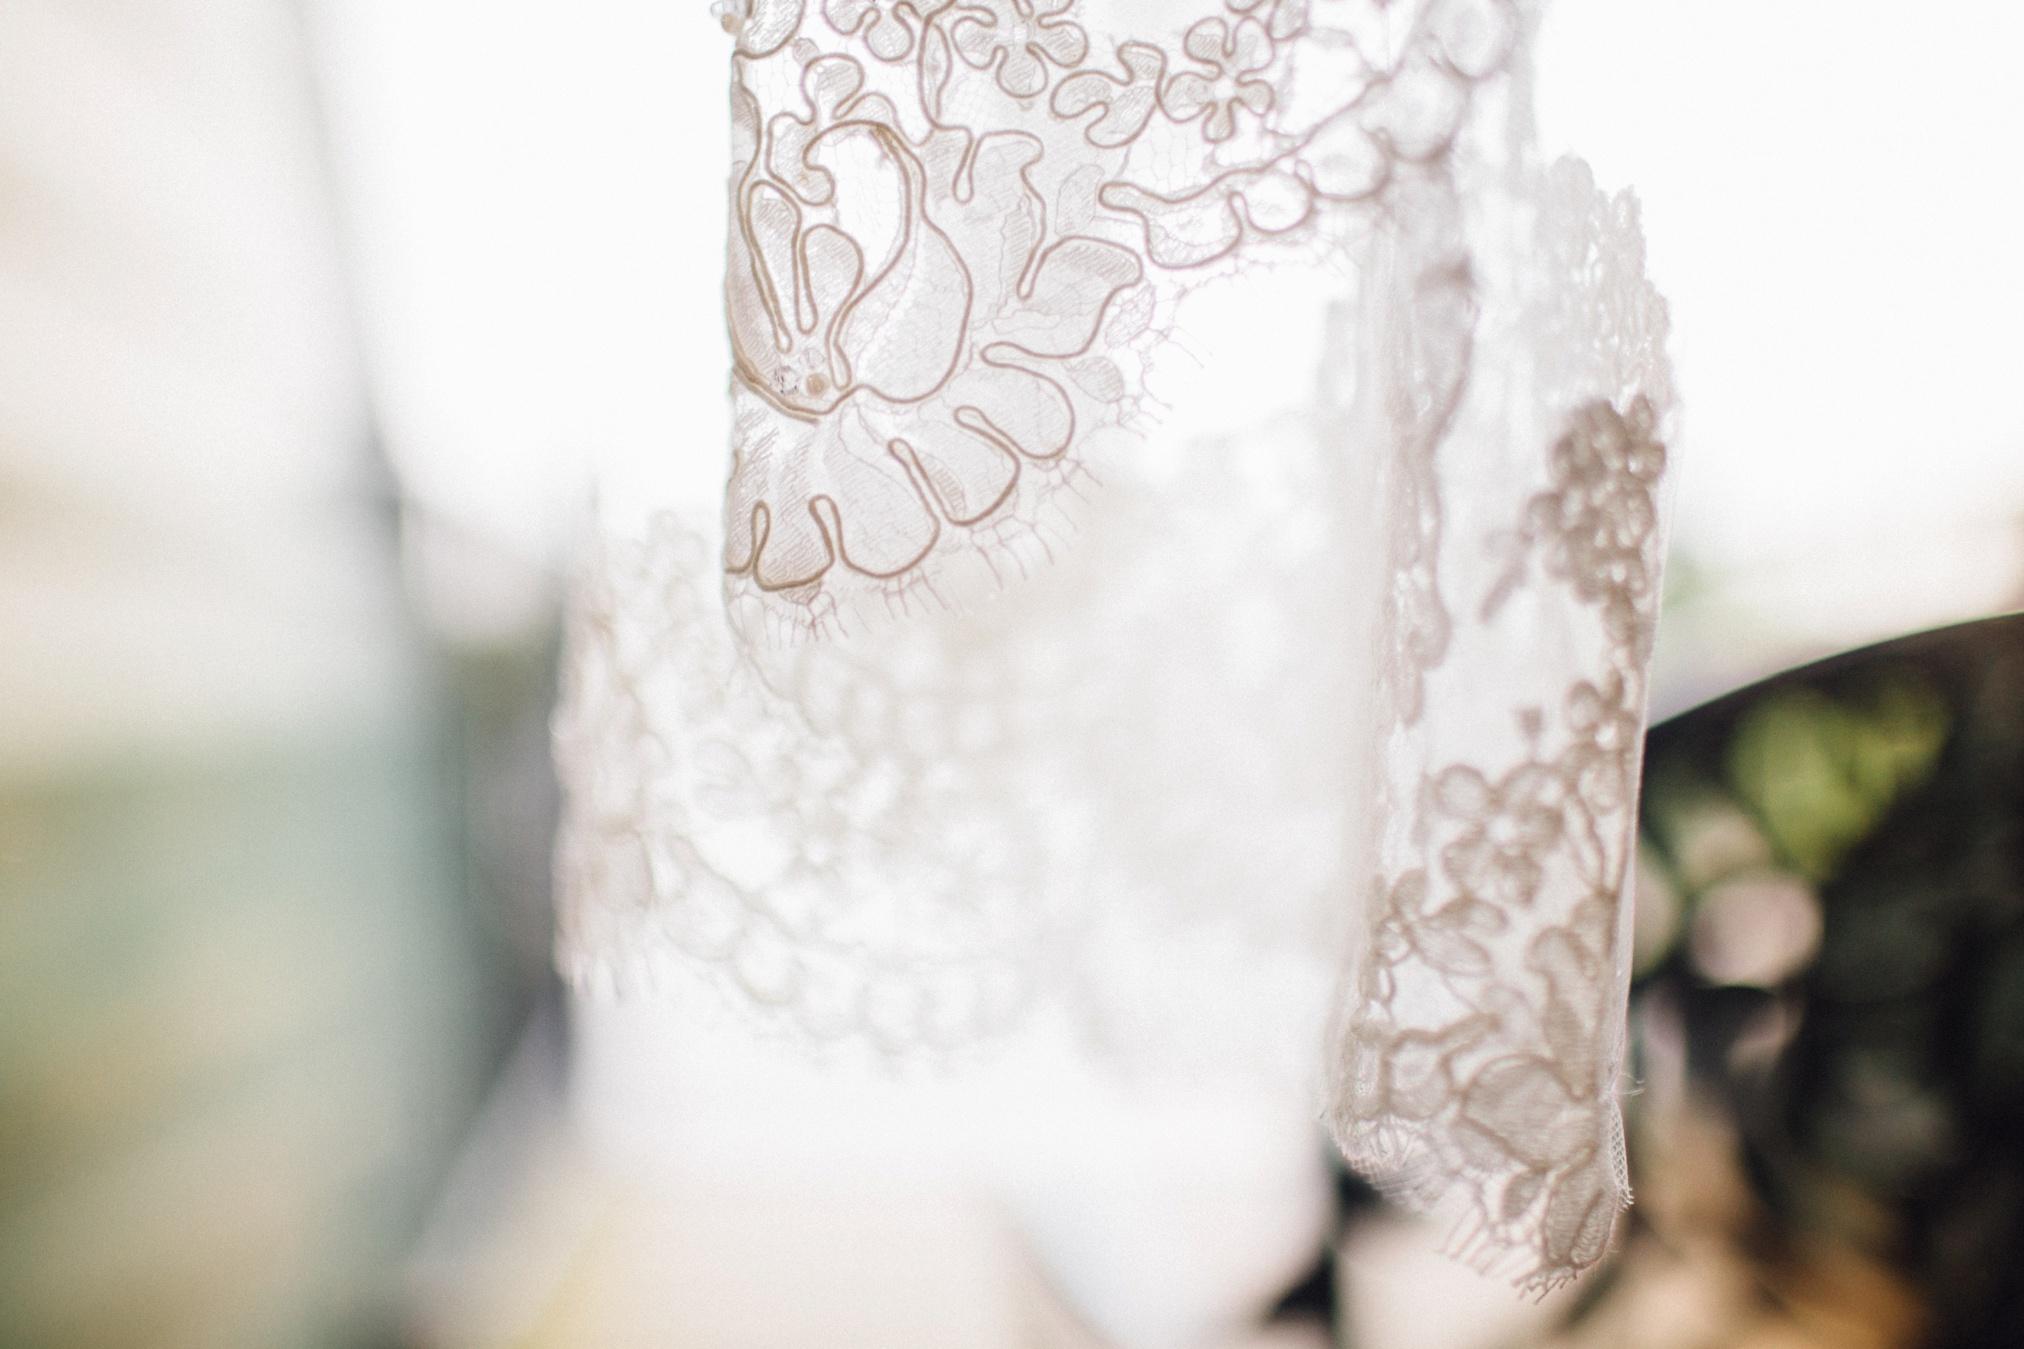 schmid_wedding-13.jpg